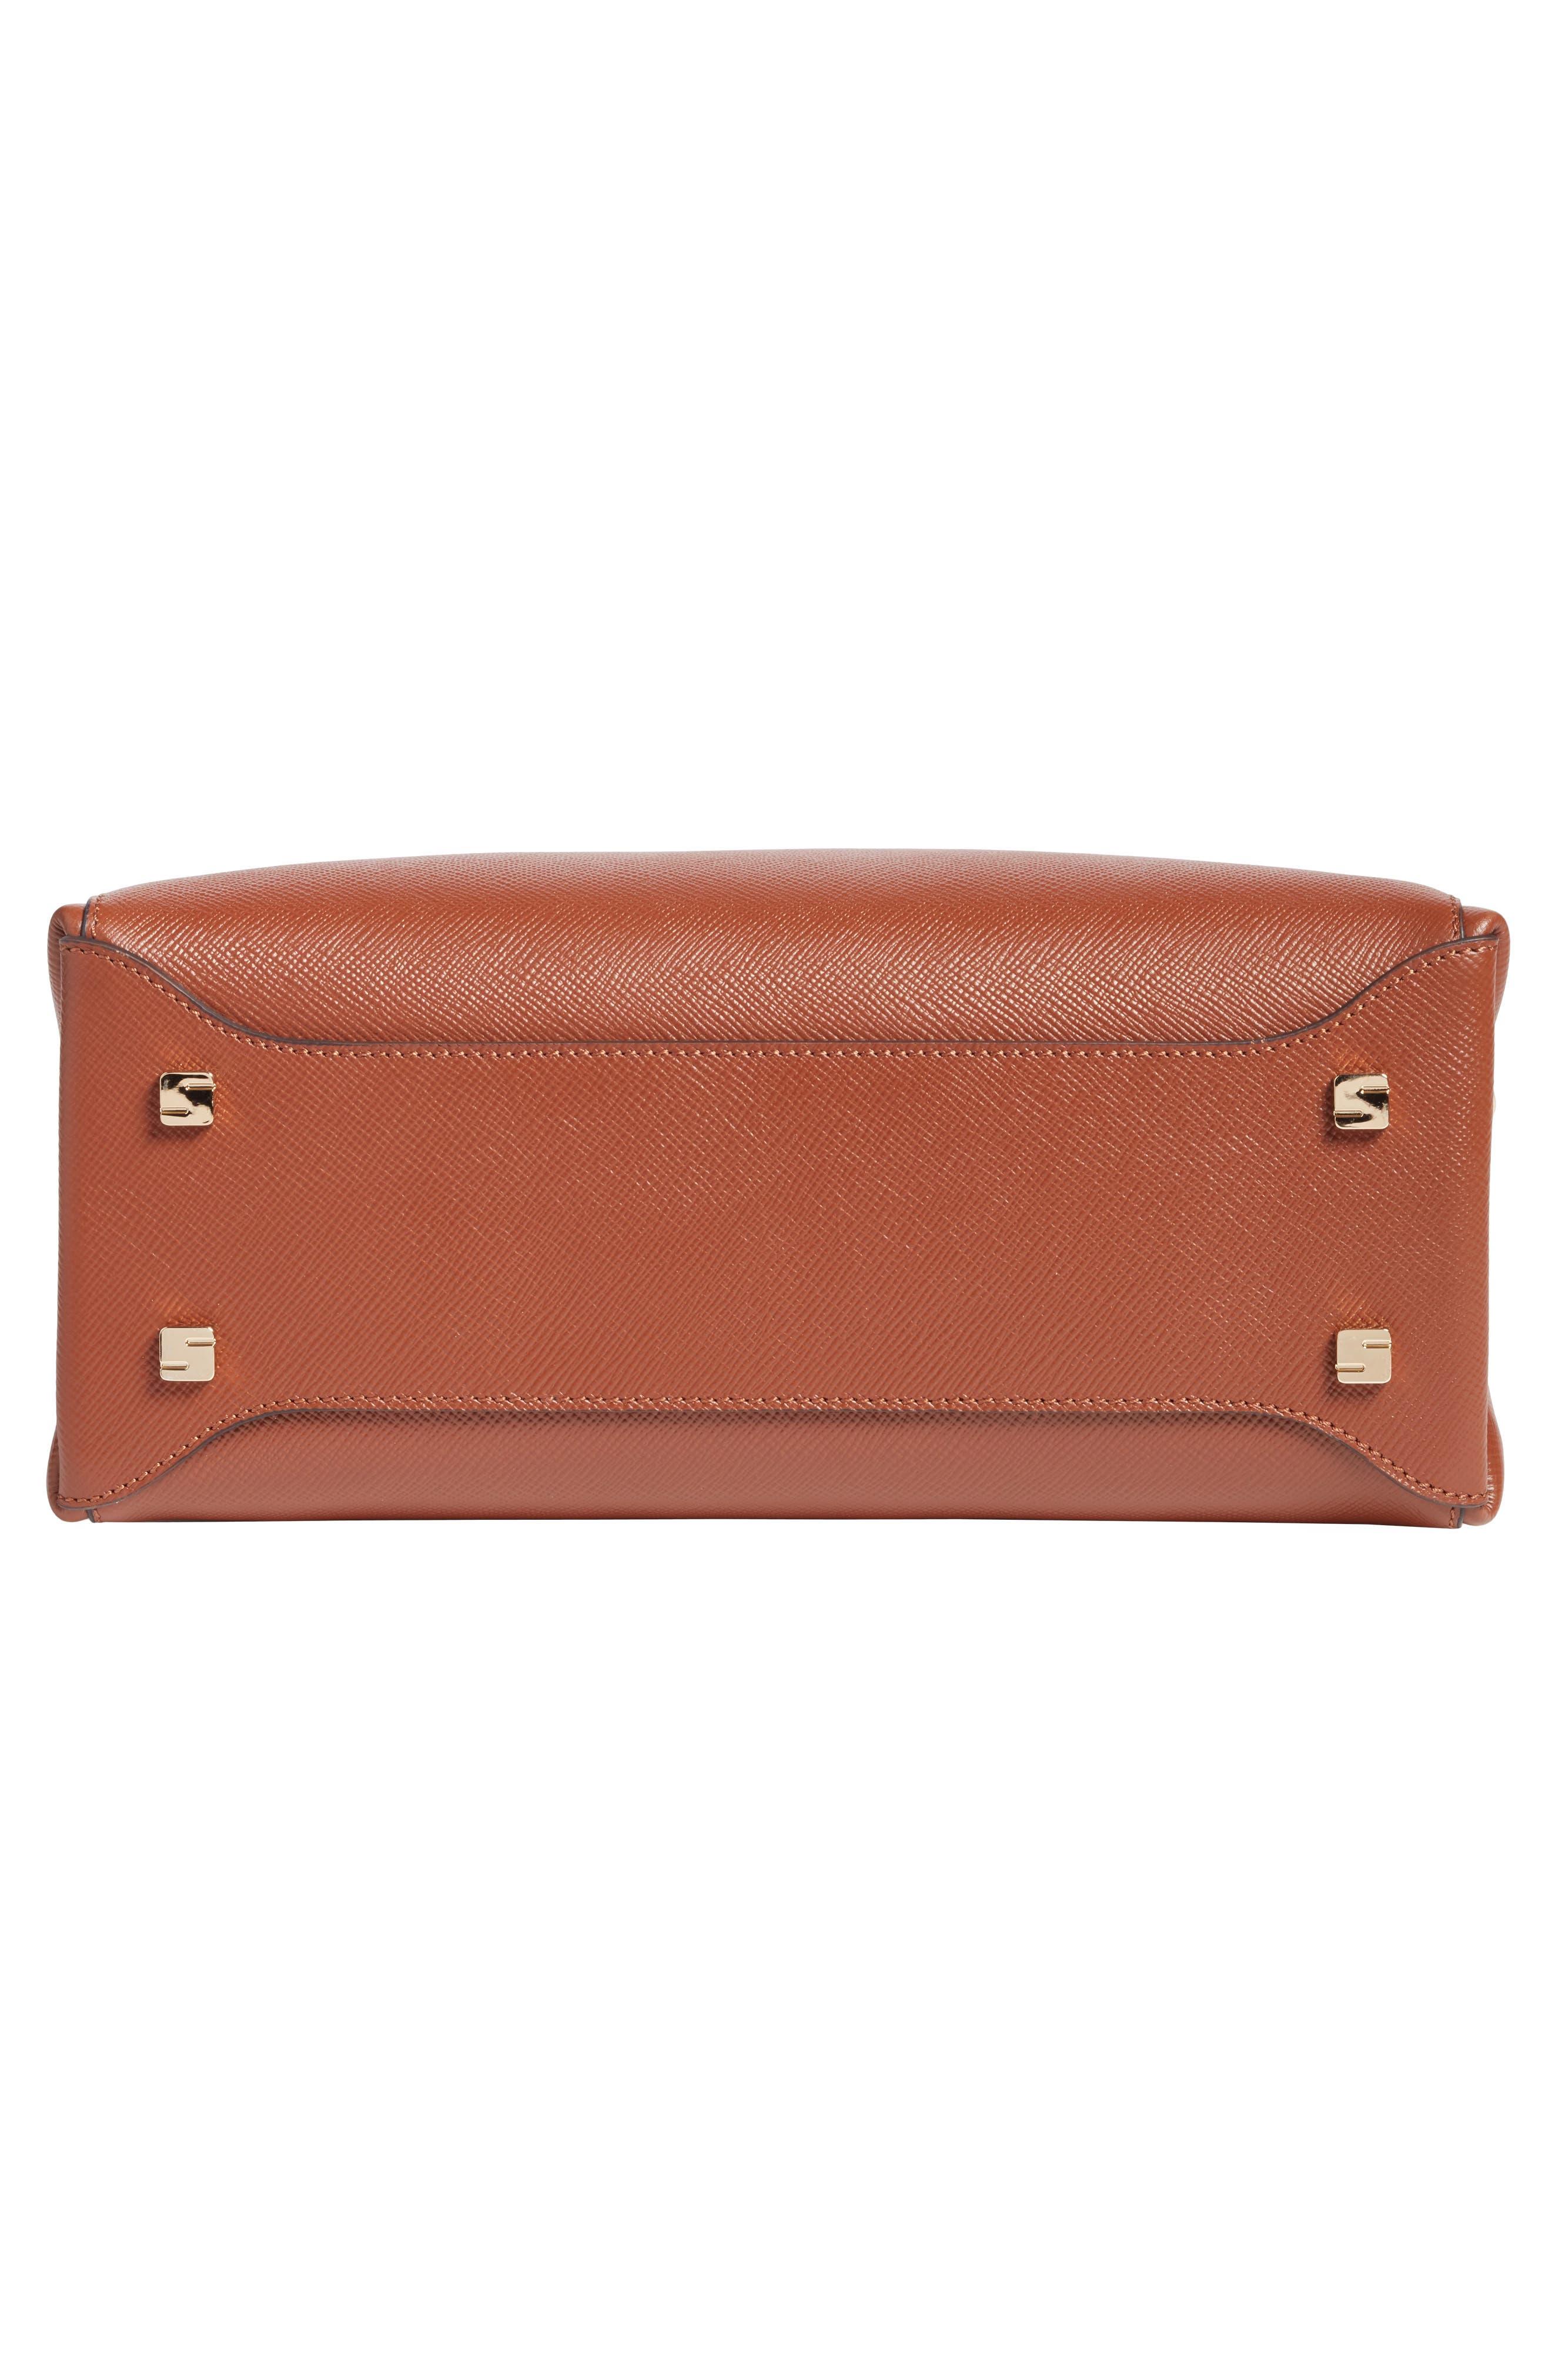 Small Meline Evolution Leather Bag,                             Alternate thumbnail 23, color,